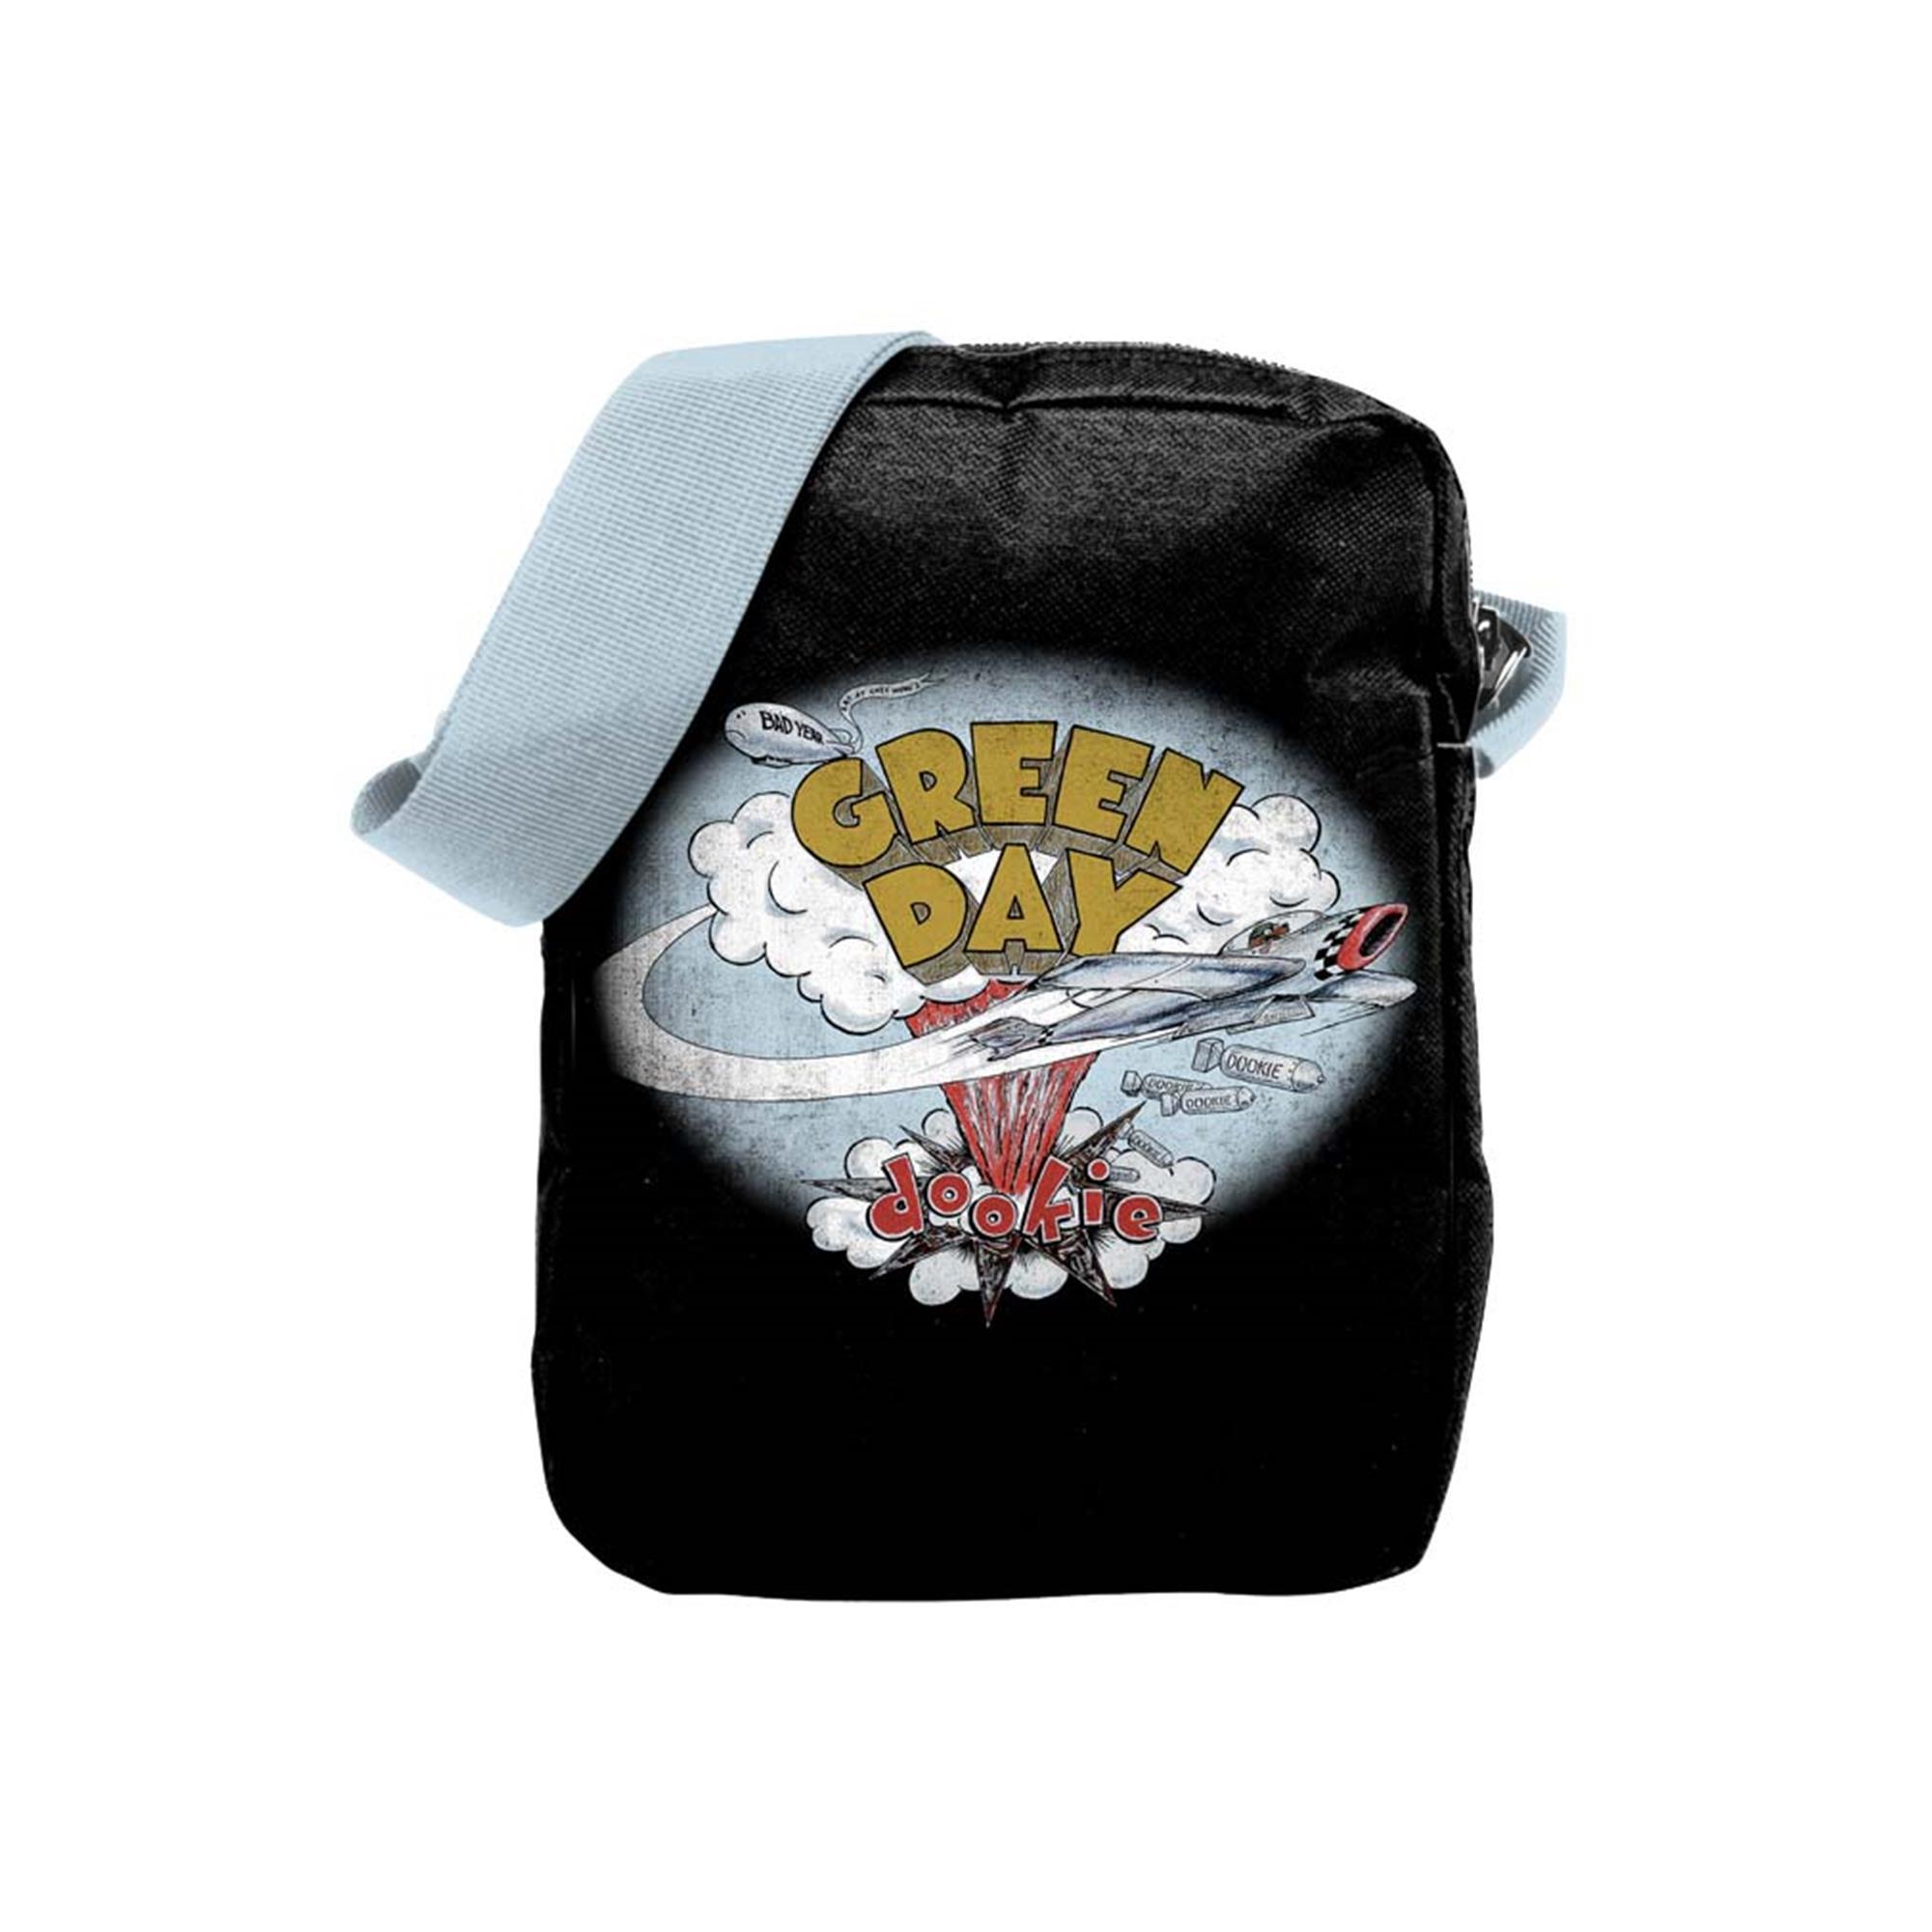 Green Day Dookie Crossbody Bag